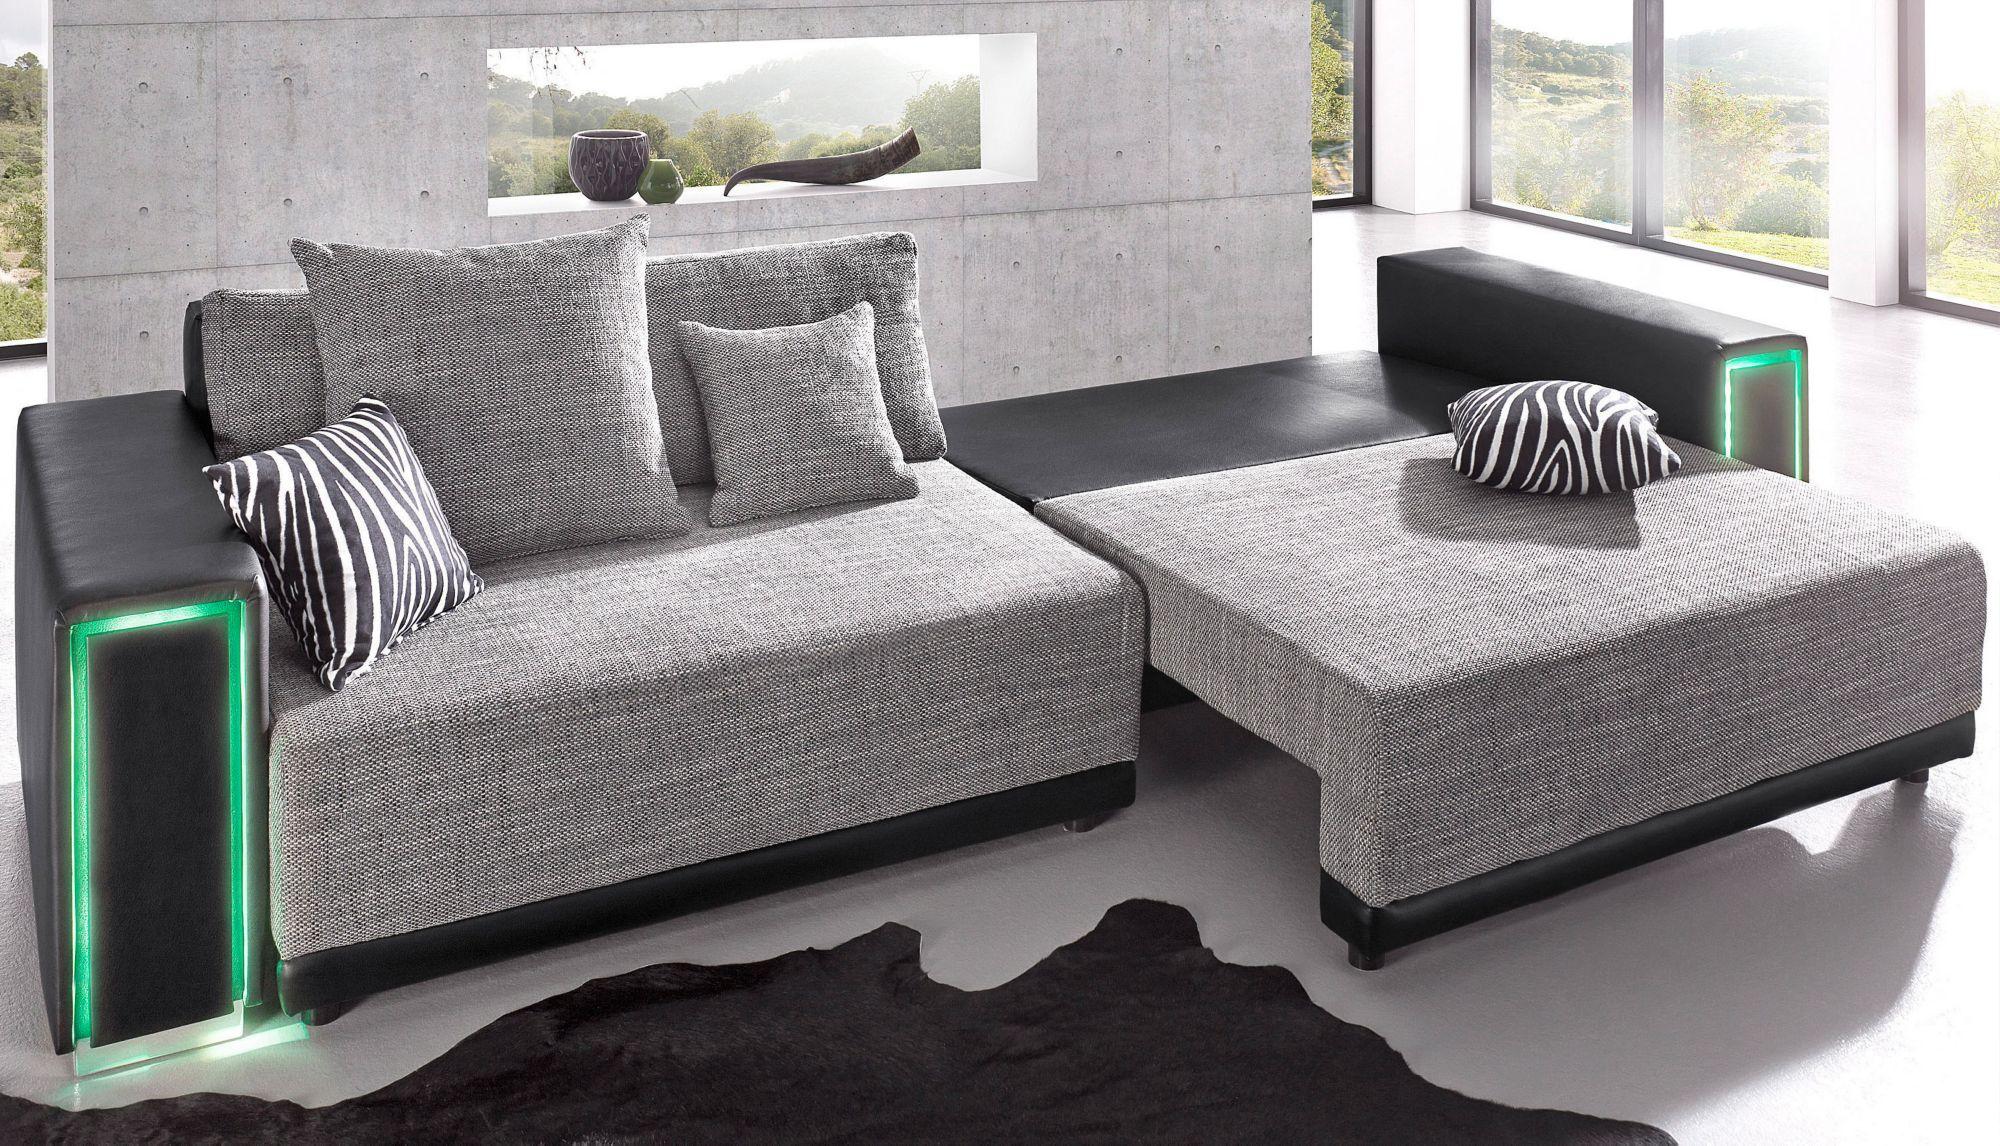 Big Sofa Led Beleuchtung : big sofa inklusive rgb led beleuchtung schwab versand sofas couches ~ Bigdaddyawards.com Haus und Dekorationen